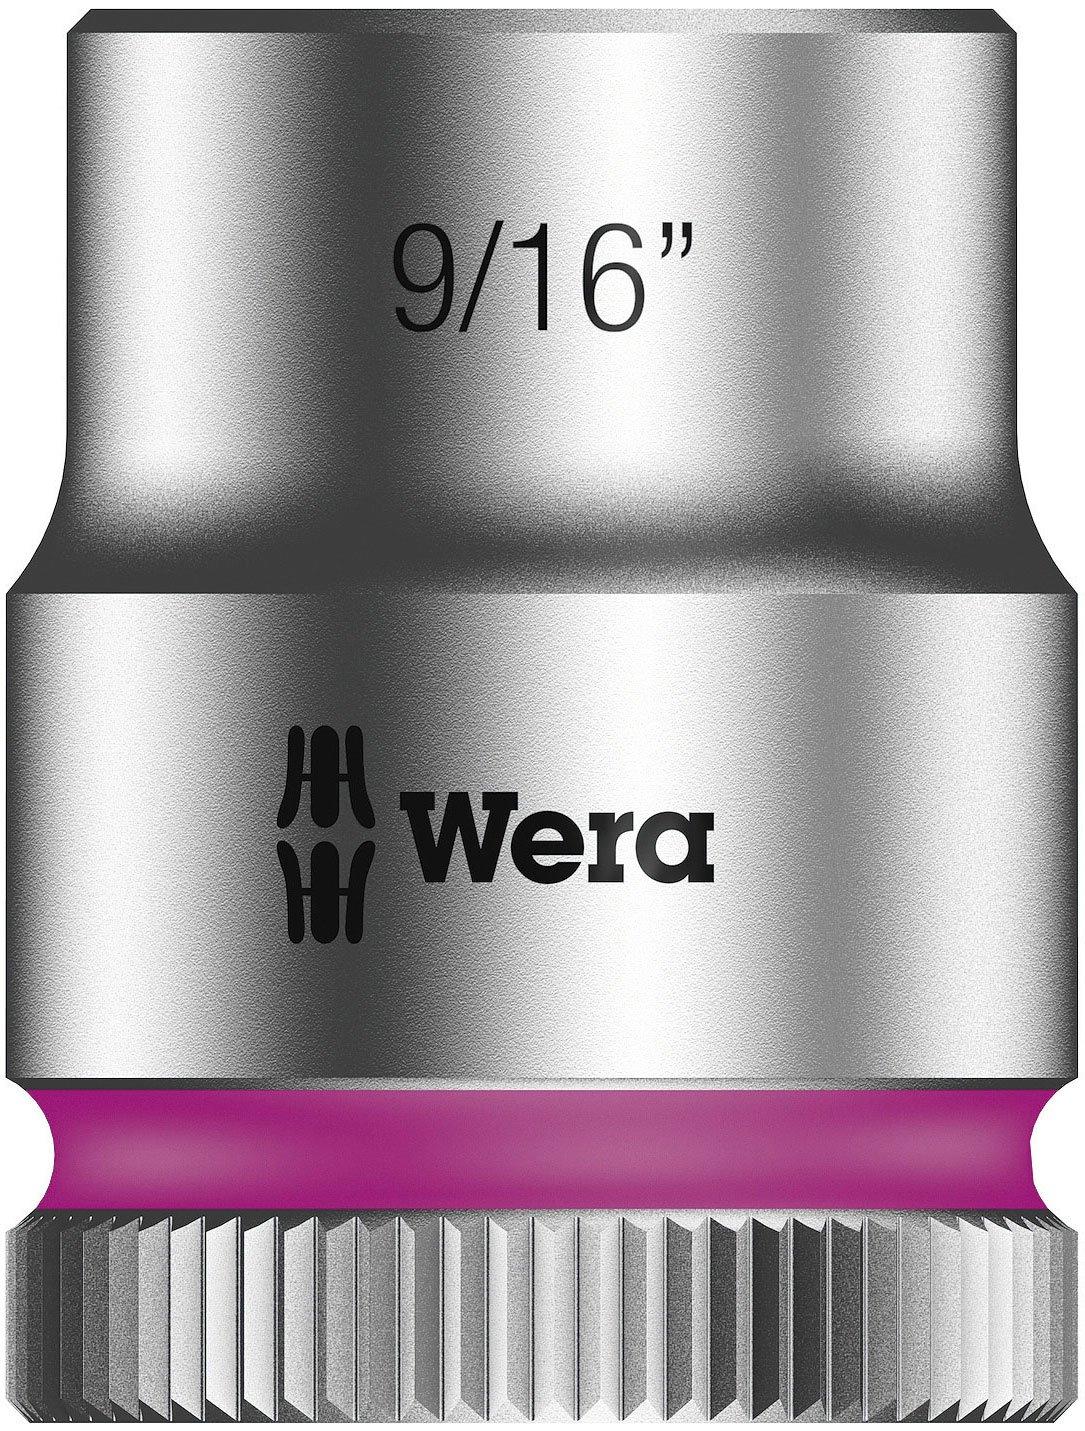 Wera Zyklop 8790 HMB 3//8 Socket Hex head 9//16 x Length 29mm Hex head 9//16 x Length 29mm Wera Tools 05003575001